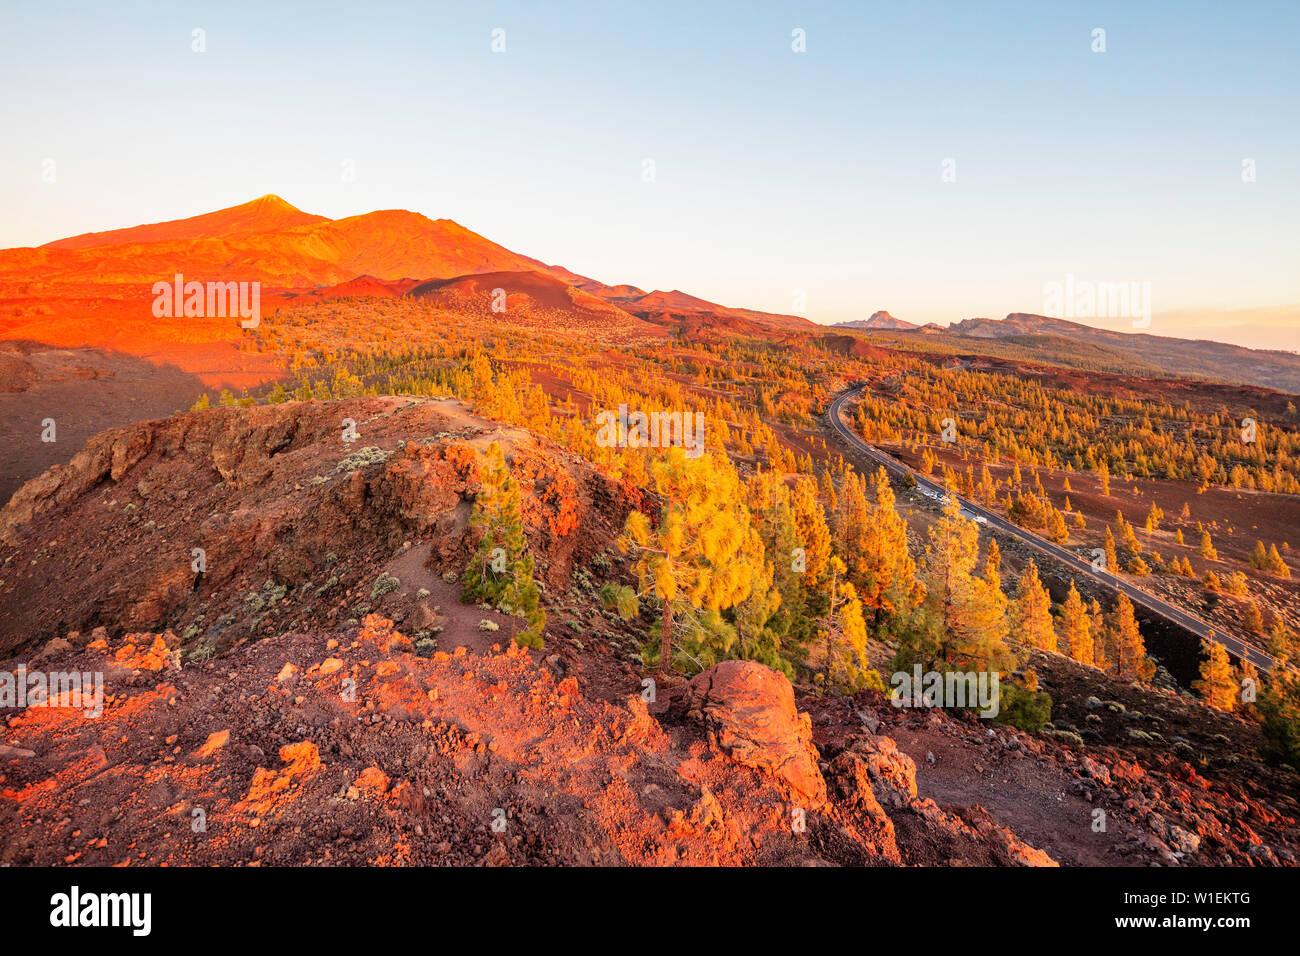 Conifer forest below Pico del Teide, 3718m, highest mountain in Spain, Teide National Park, UNESCO, Tenerife, Canary Islands, Spain, Atlantic - Stock Image